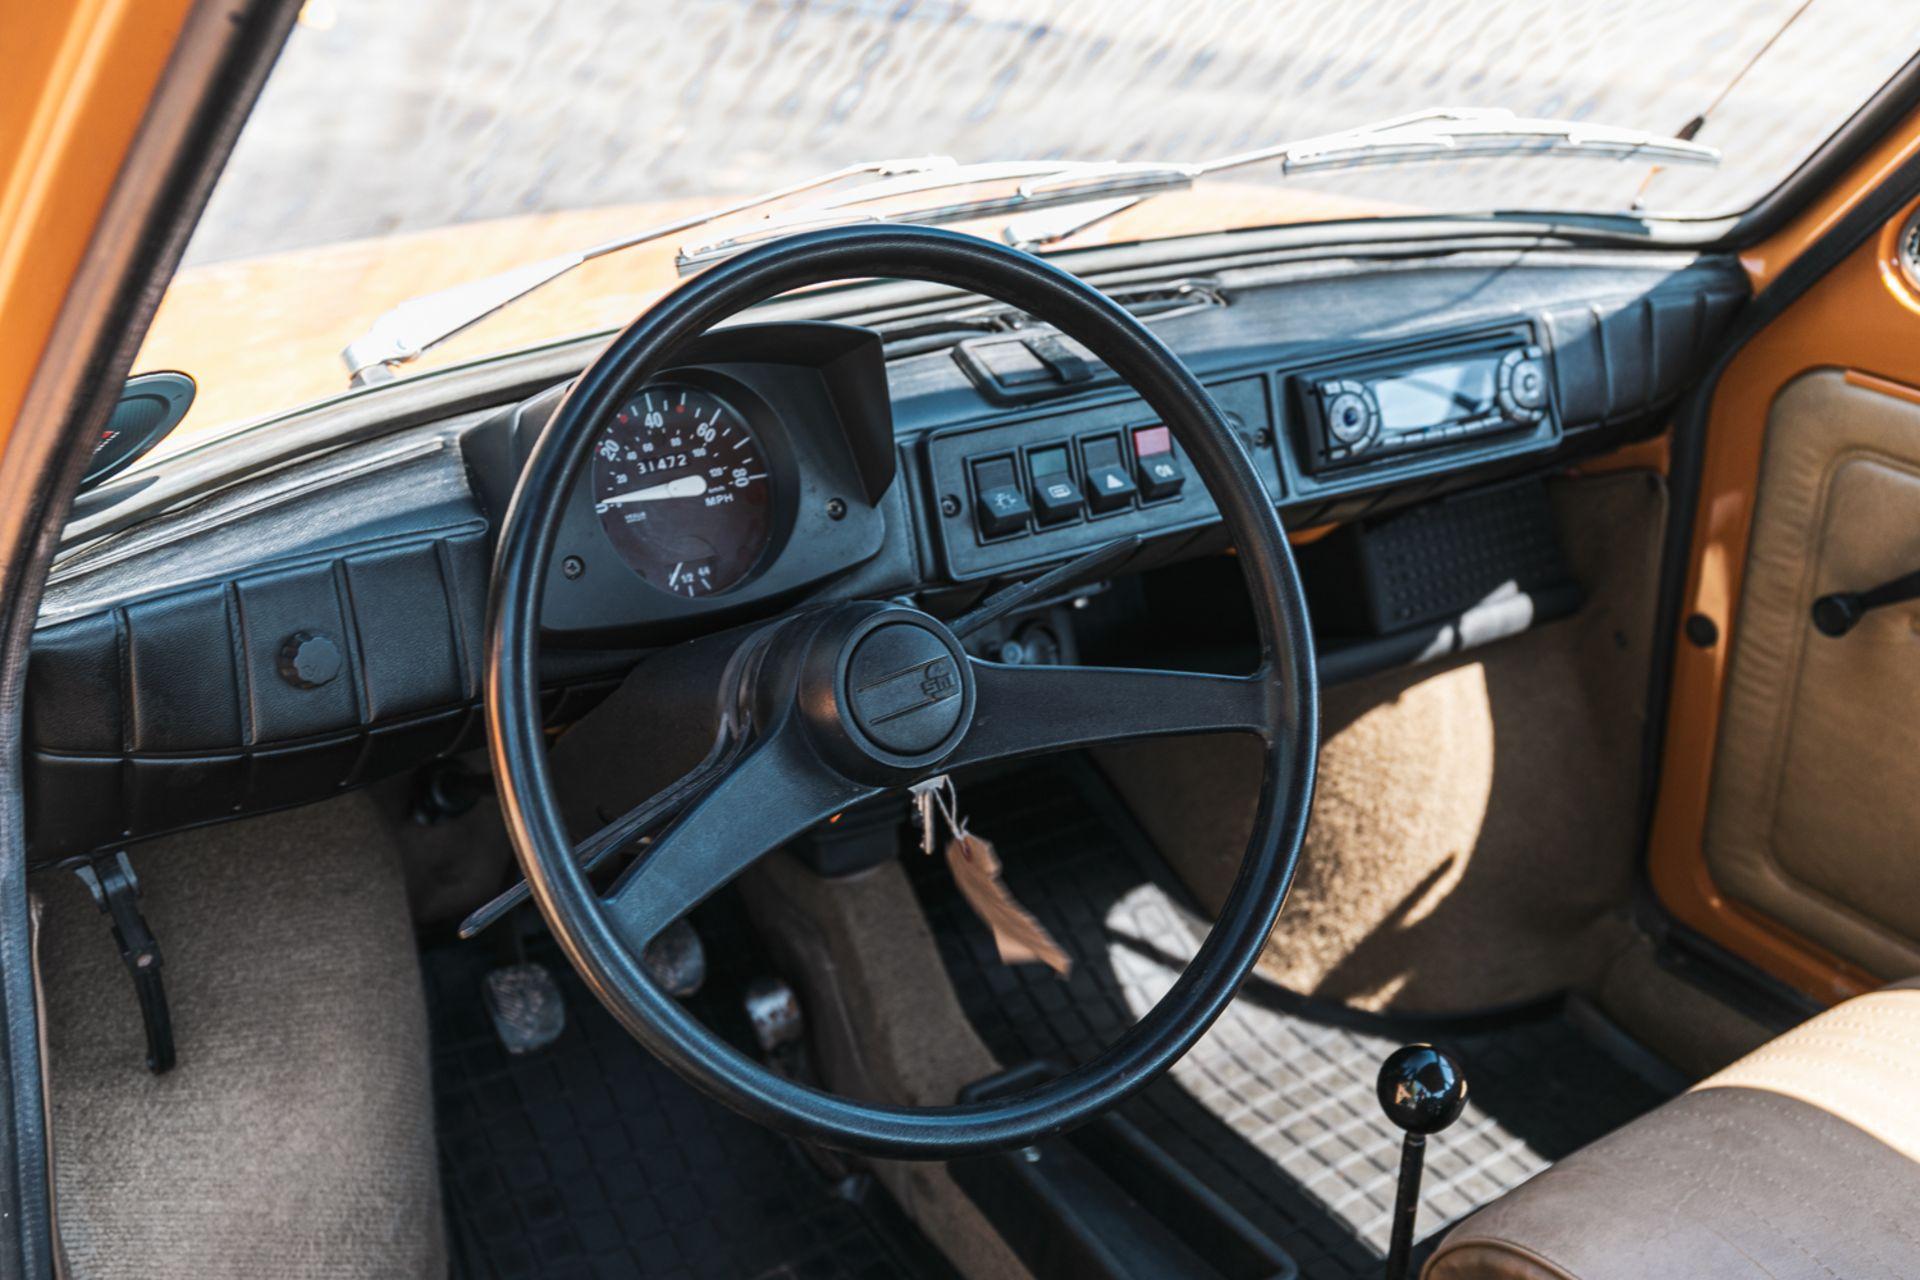 Lot 110 - 1983 Polski Fiat 126p